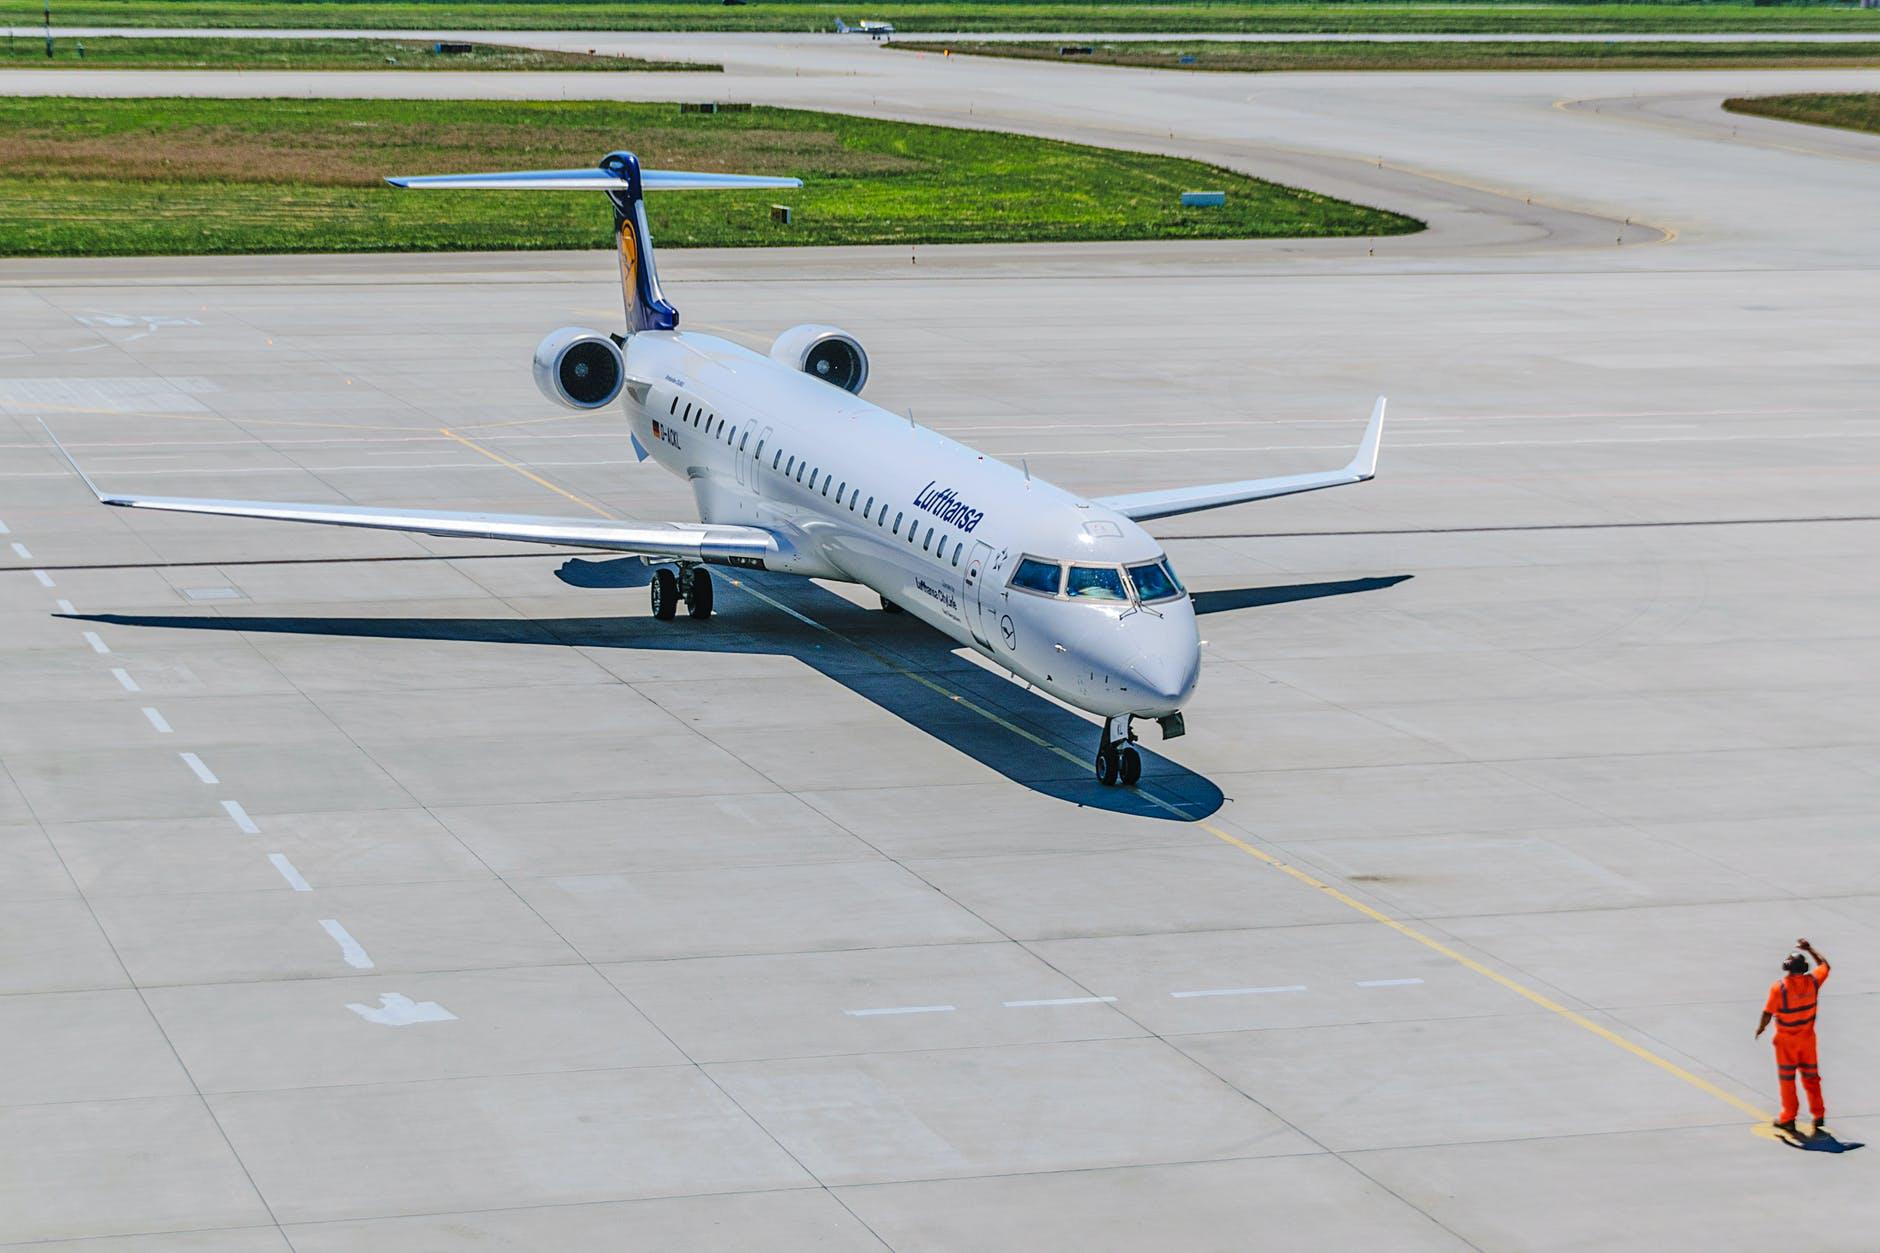 Airport Pavement Evaluation